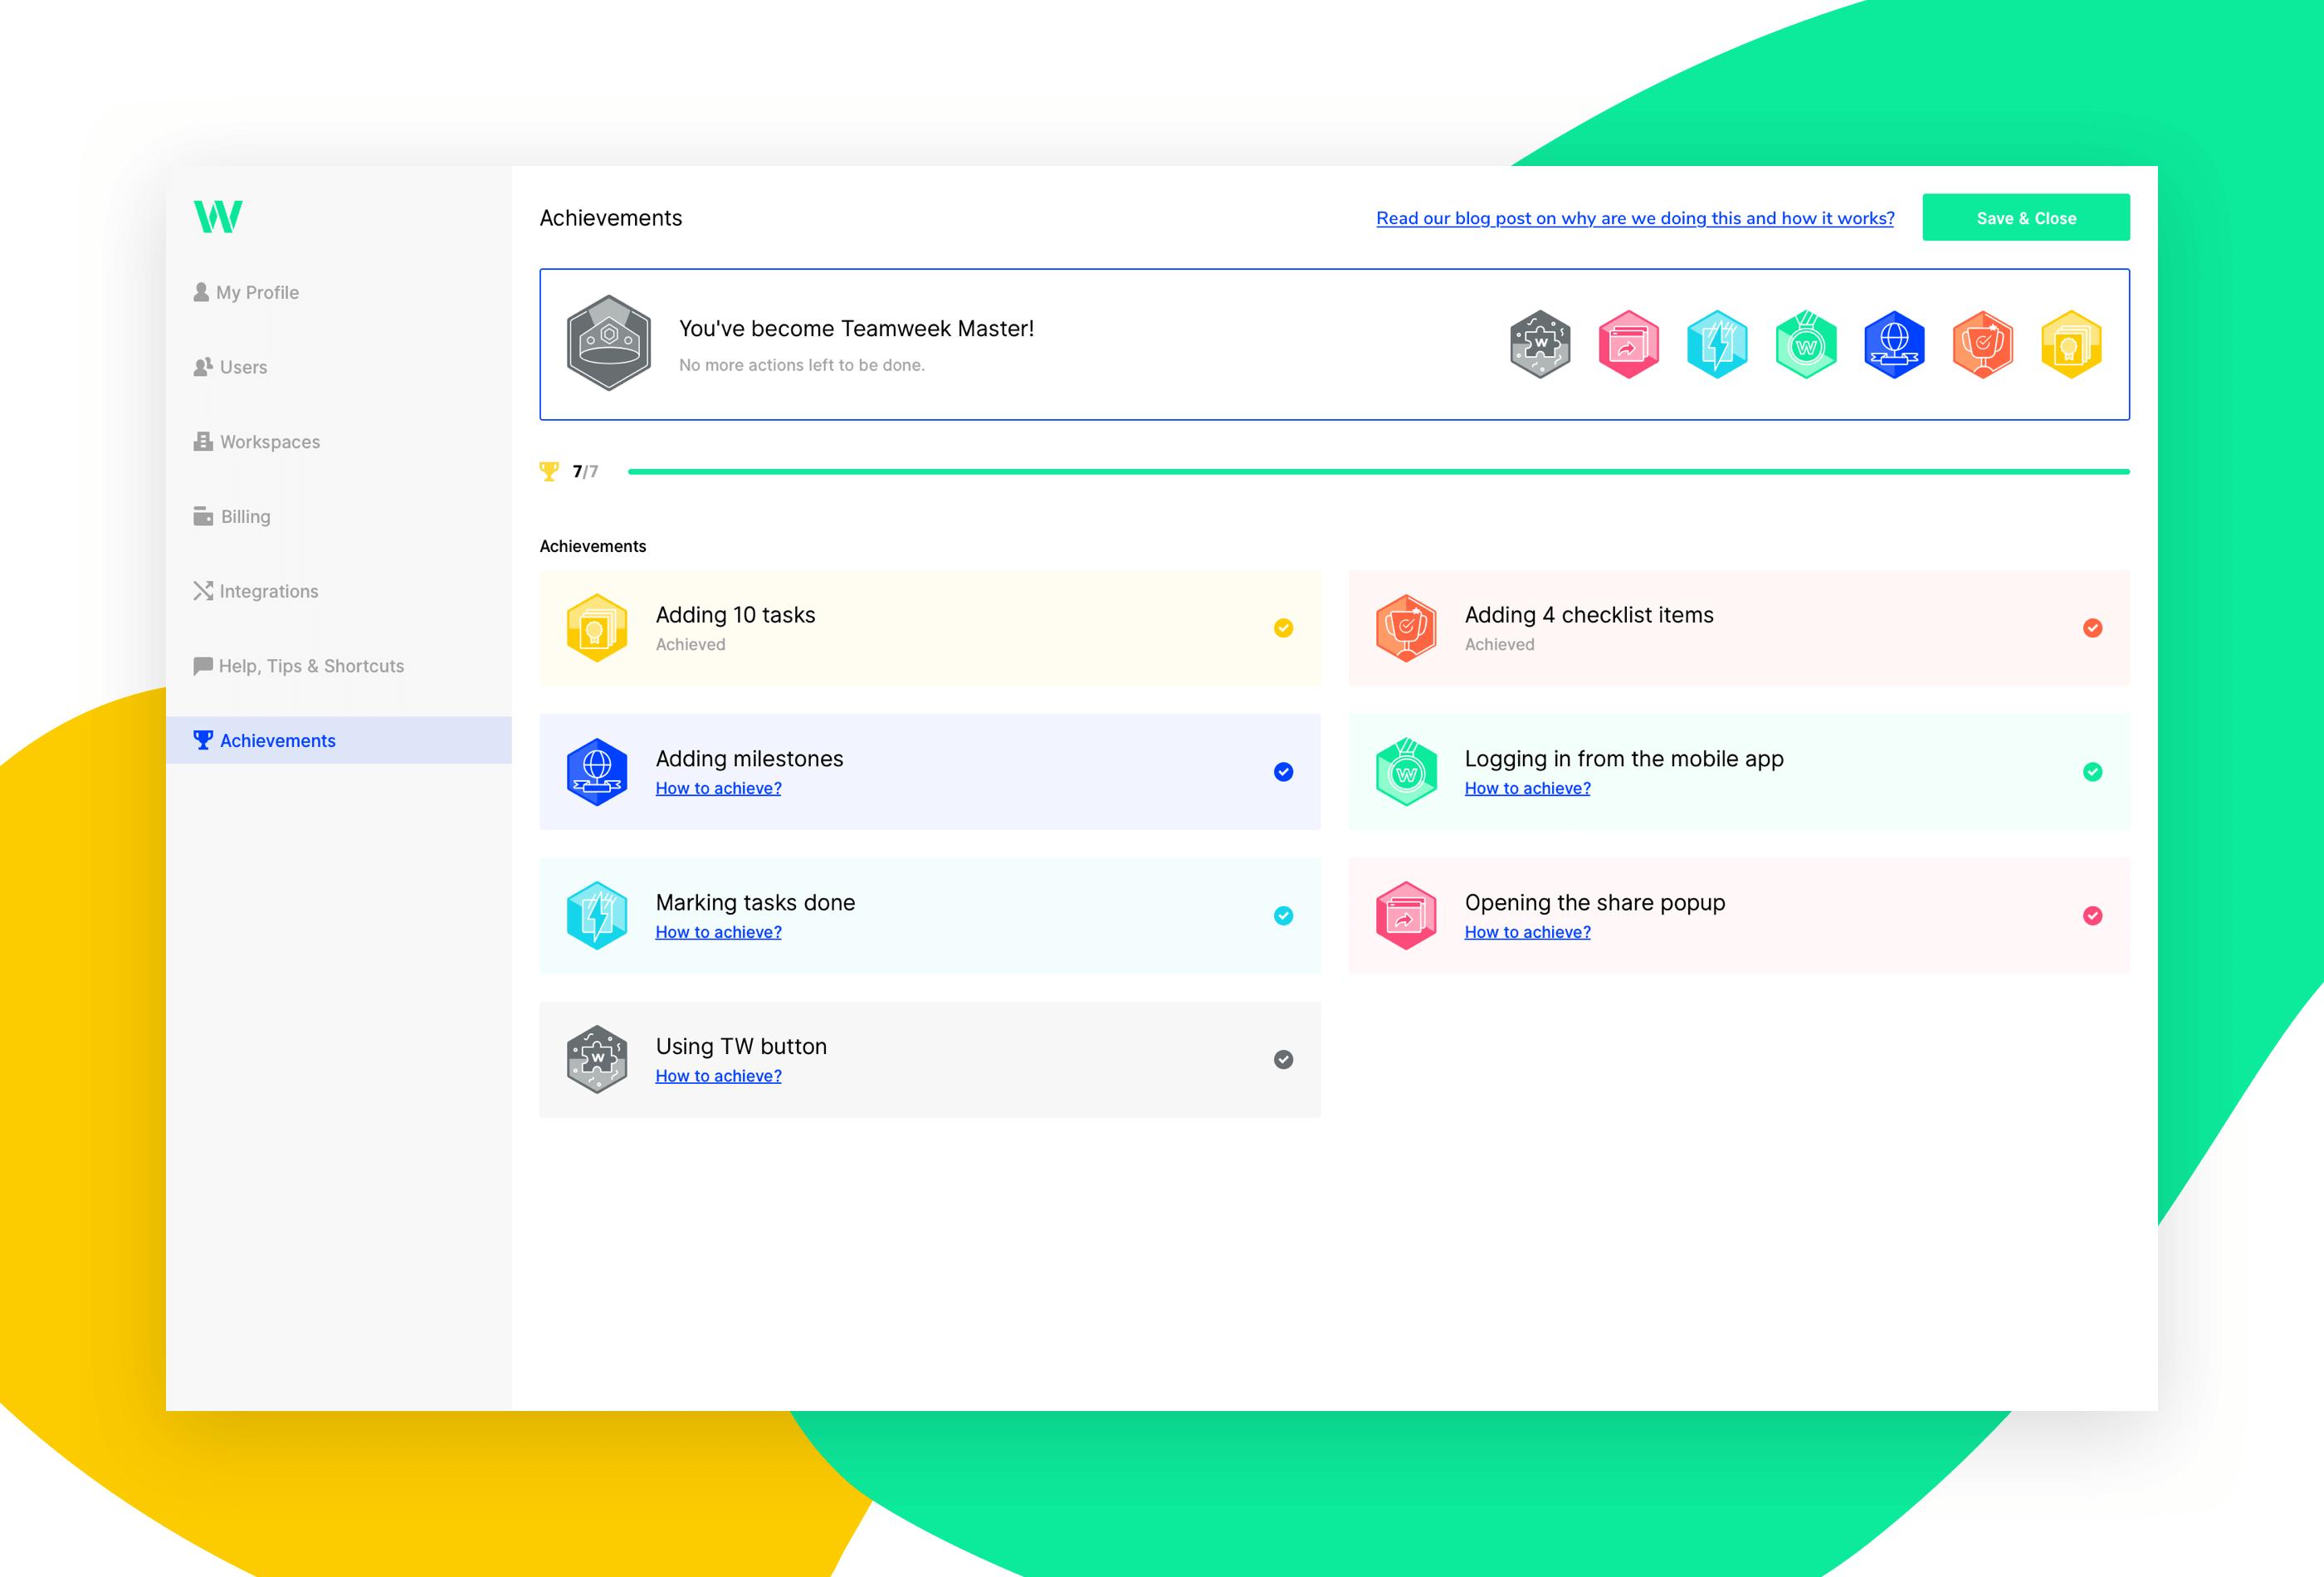 Teamweek achievements